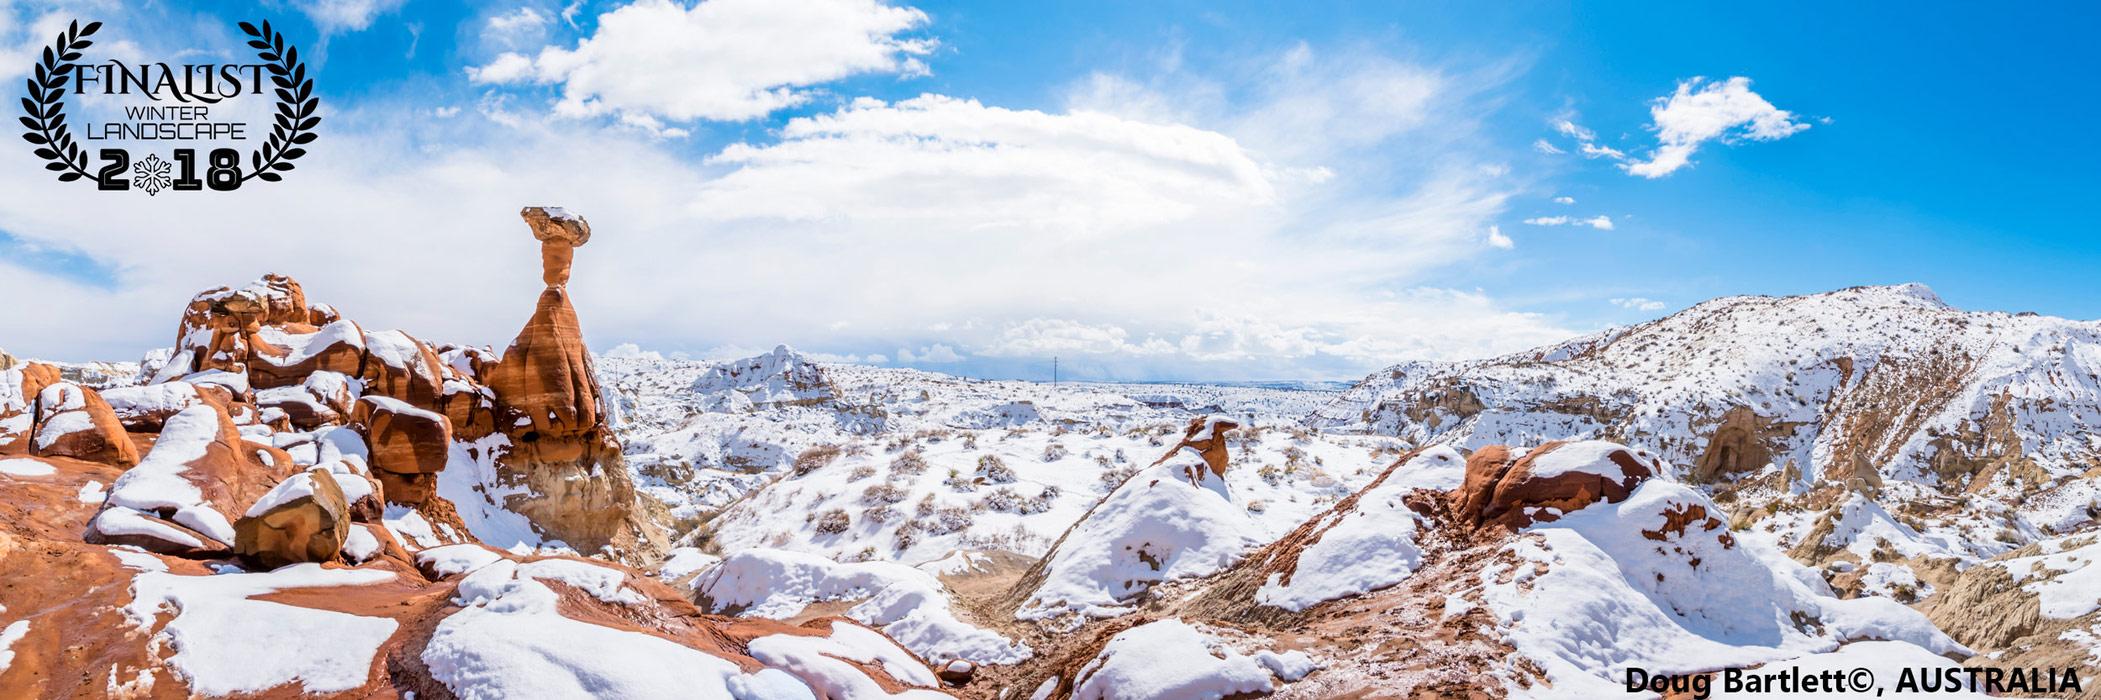 Зимняя заколдованная поганка, © Дуг Бартлетт, Австралия, Финалист фестиваля «Зимний пейзаж», Фотоконкурс пейзажа журнала Renner